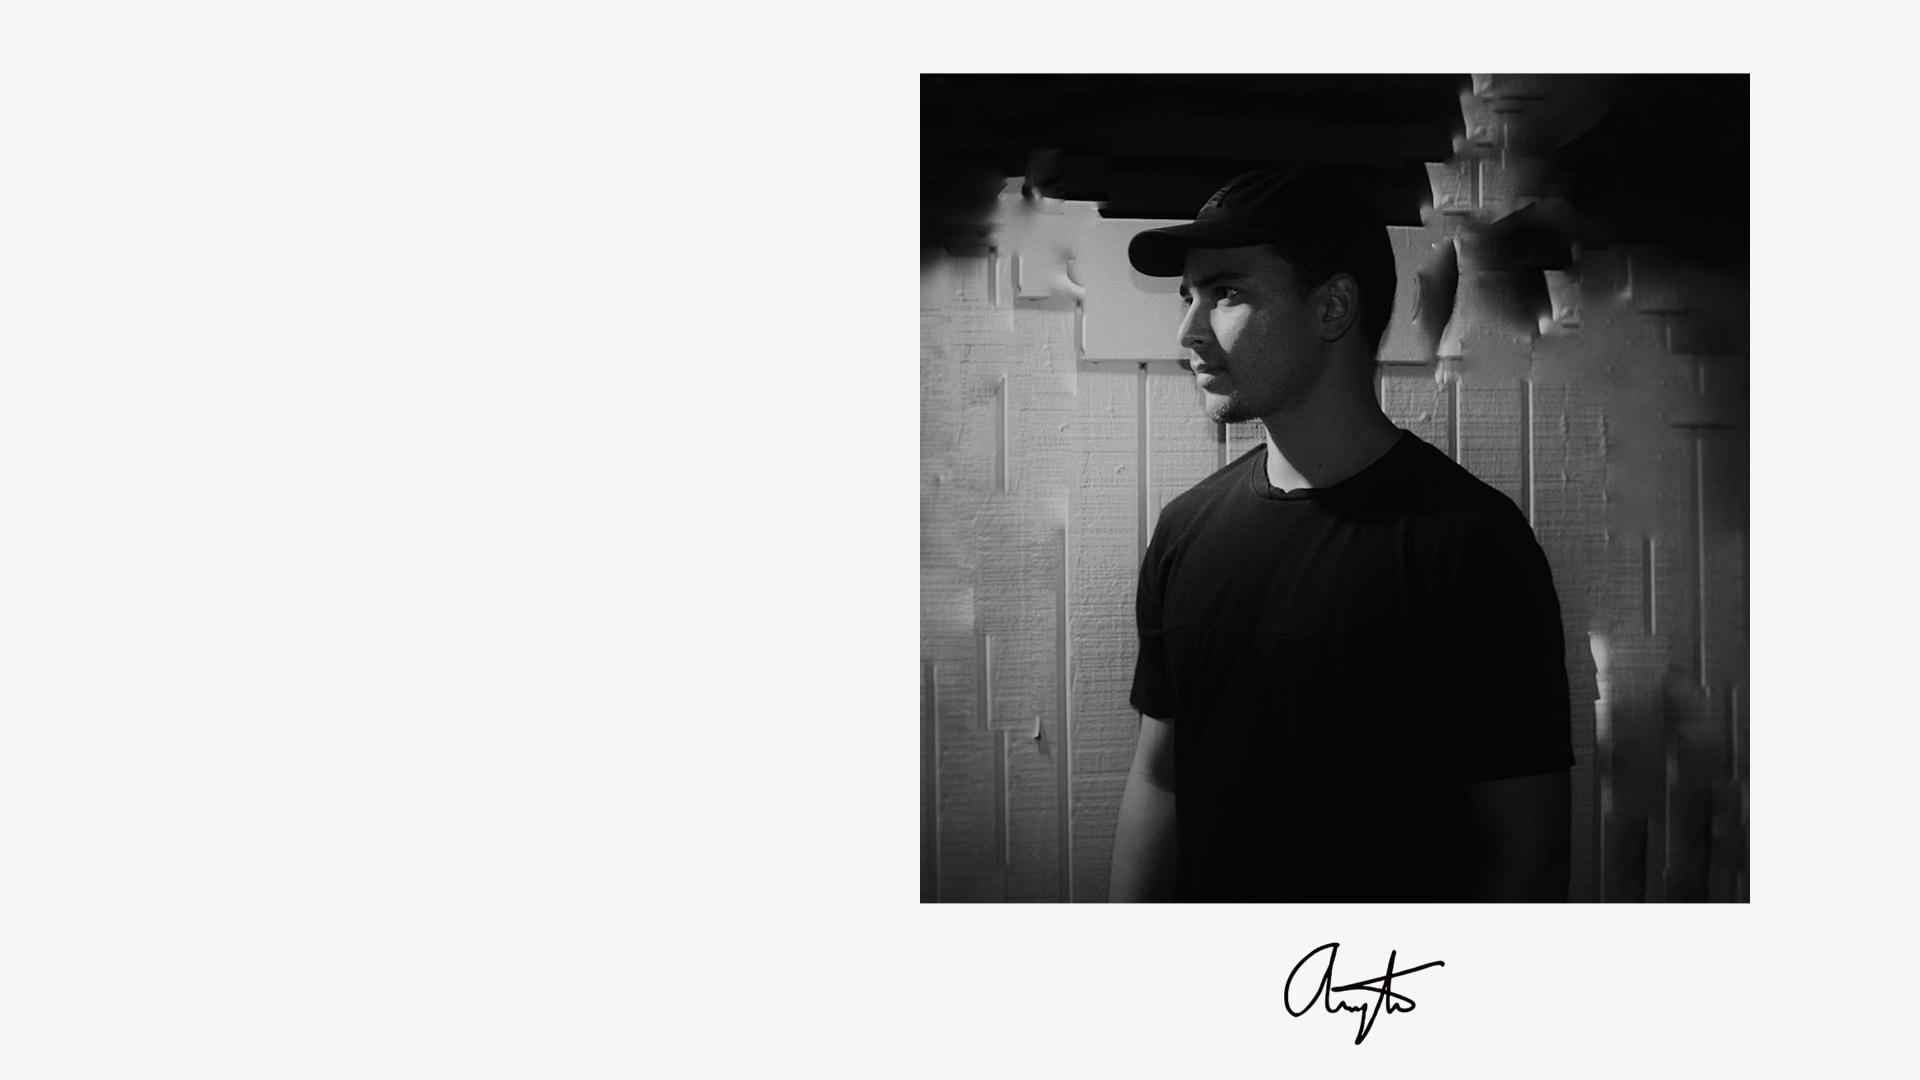 Aryton Page<br/>美国新锐艺术家,极简缔造者